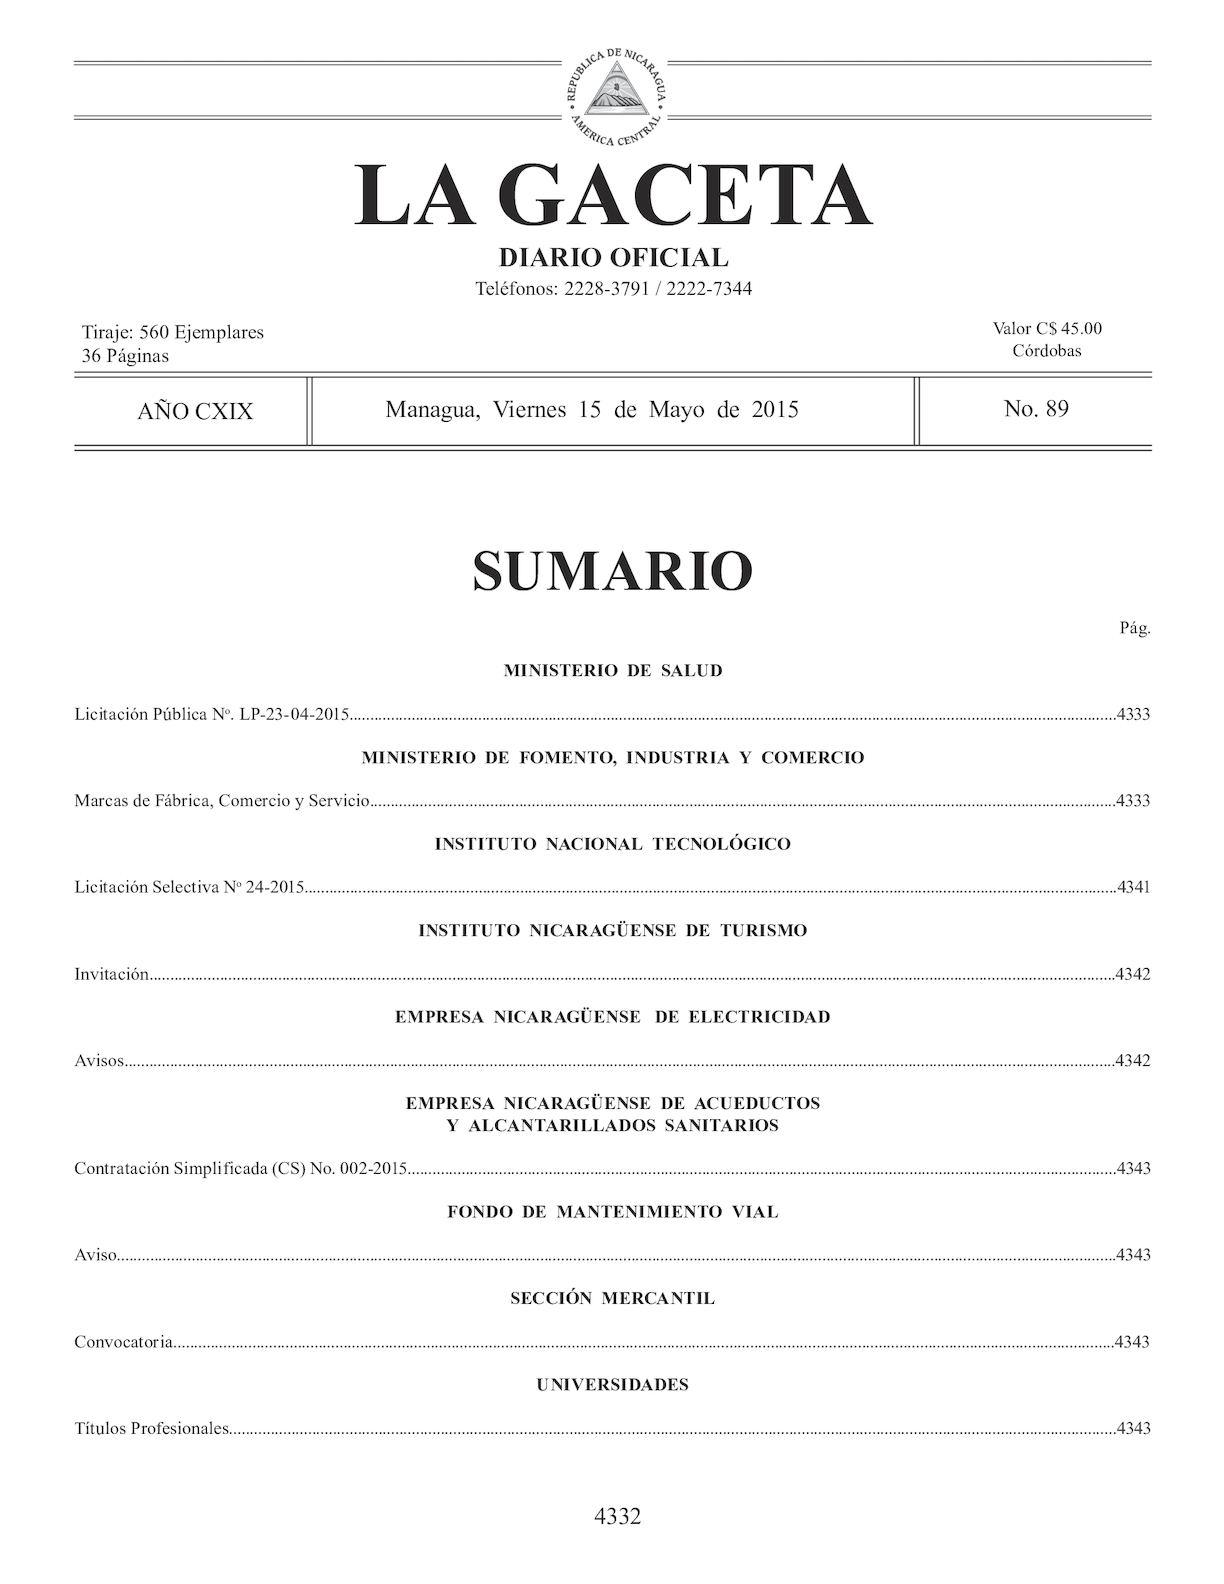 Gaceta No 89 Viernes 15 Mayo 2015